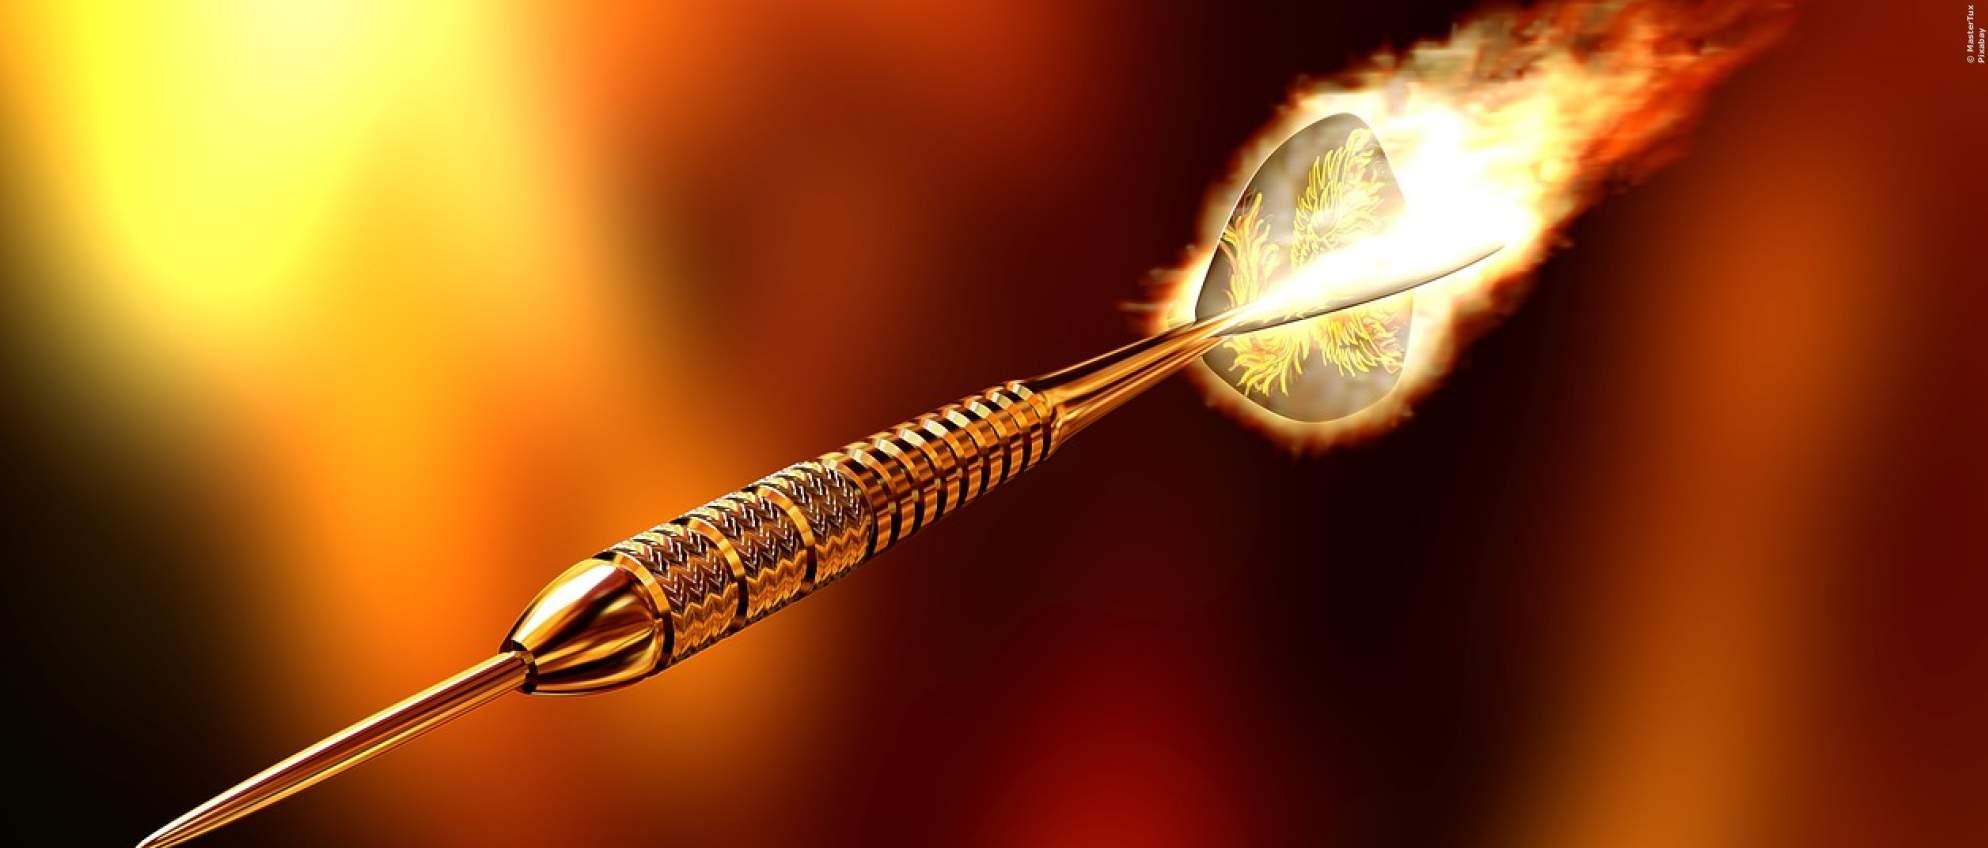 Dartpfeil - Symbolbild